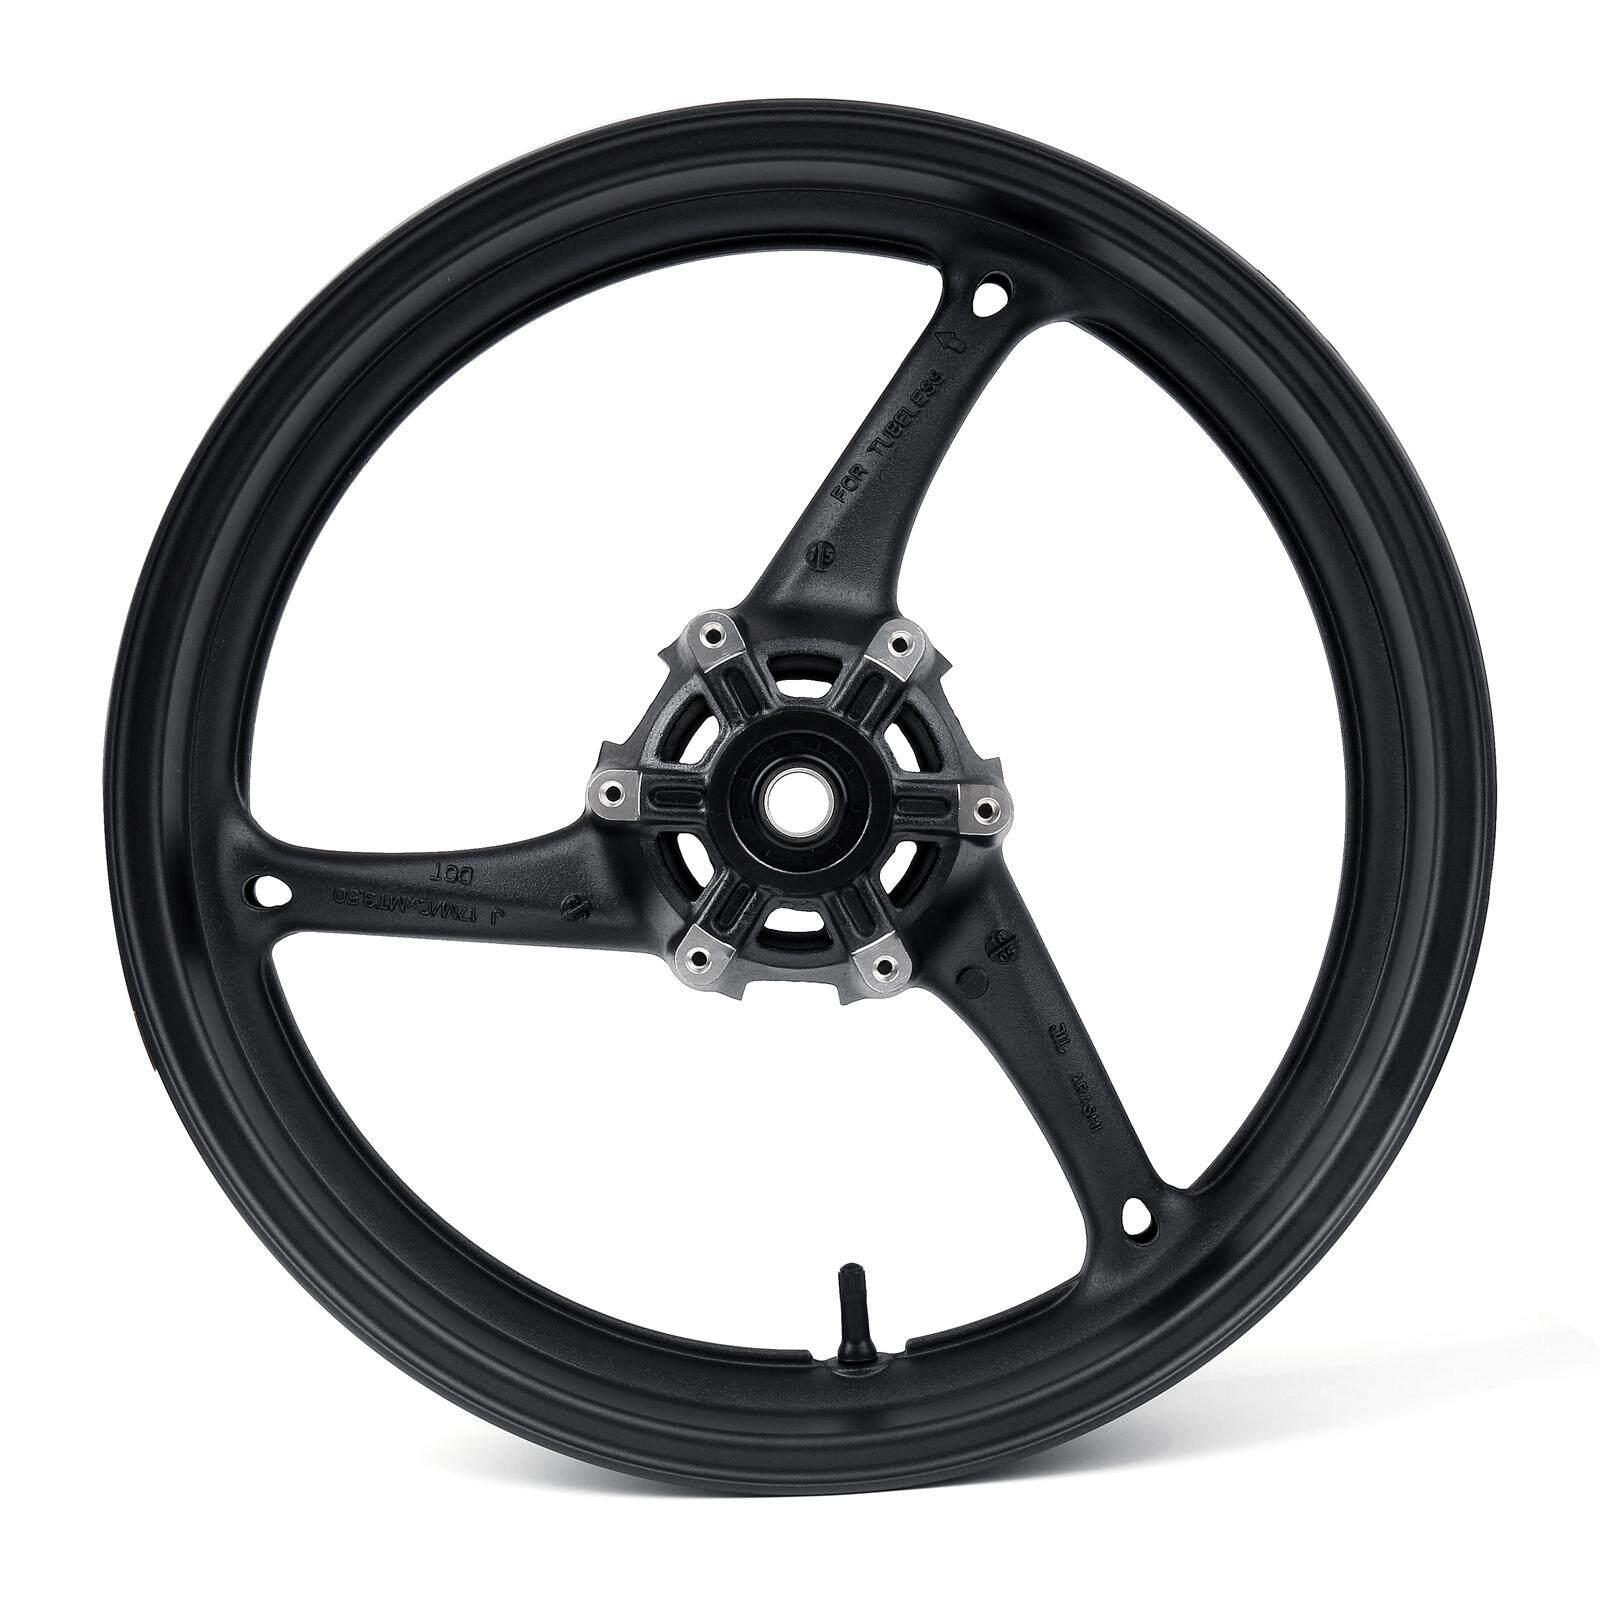 27cm 10-inch Fit for Yamaha PY50 /& PW50 Motorcycle Gazechimp Front Rim Wheel Replacement Part Black